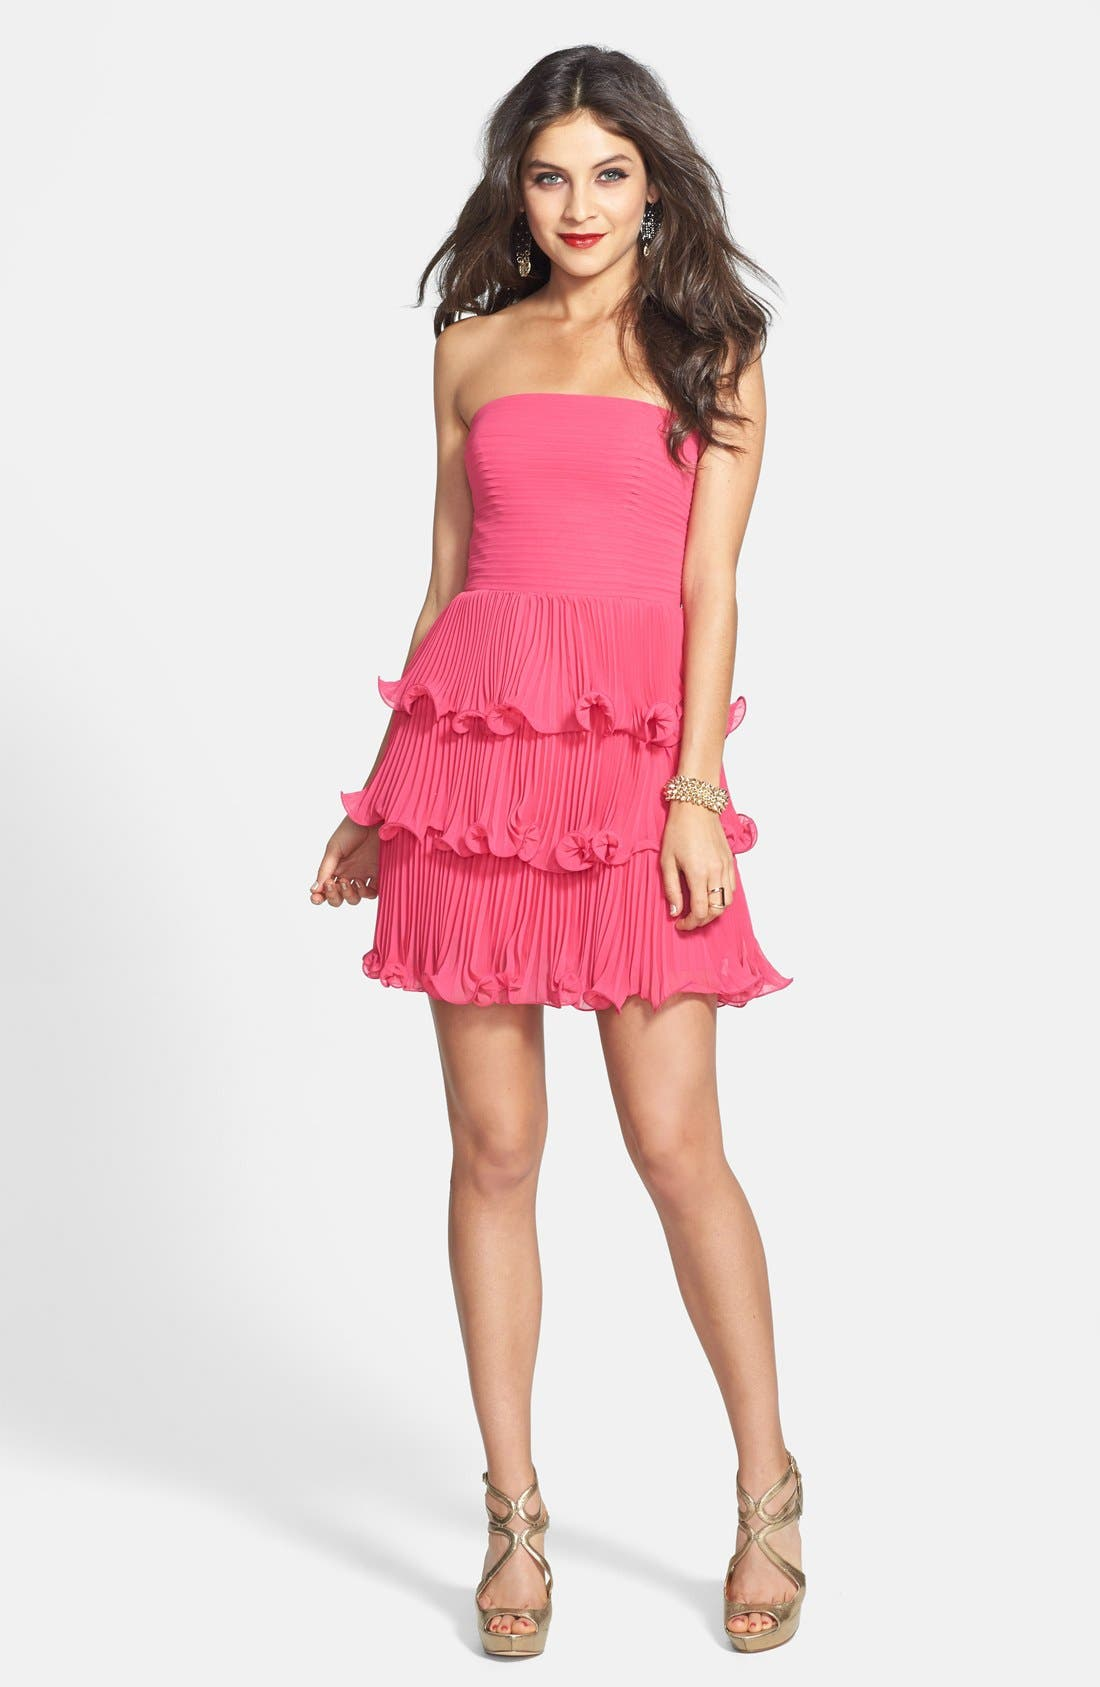 Main Image - ERIN erin fetherston 'Sweet Pea' Chiffon Dress